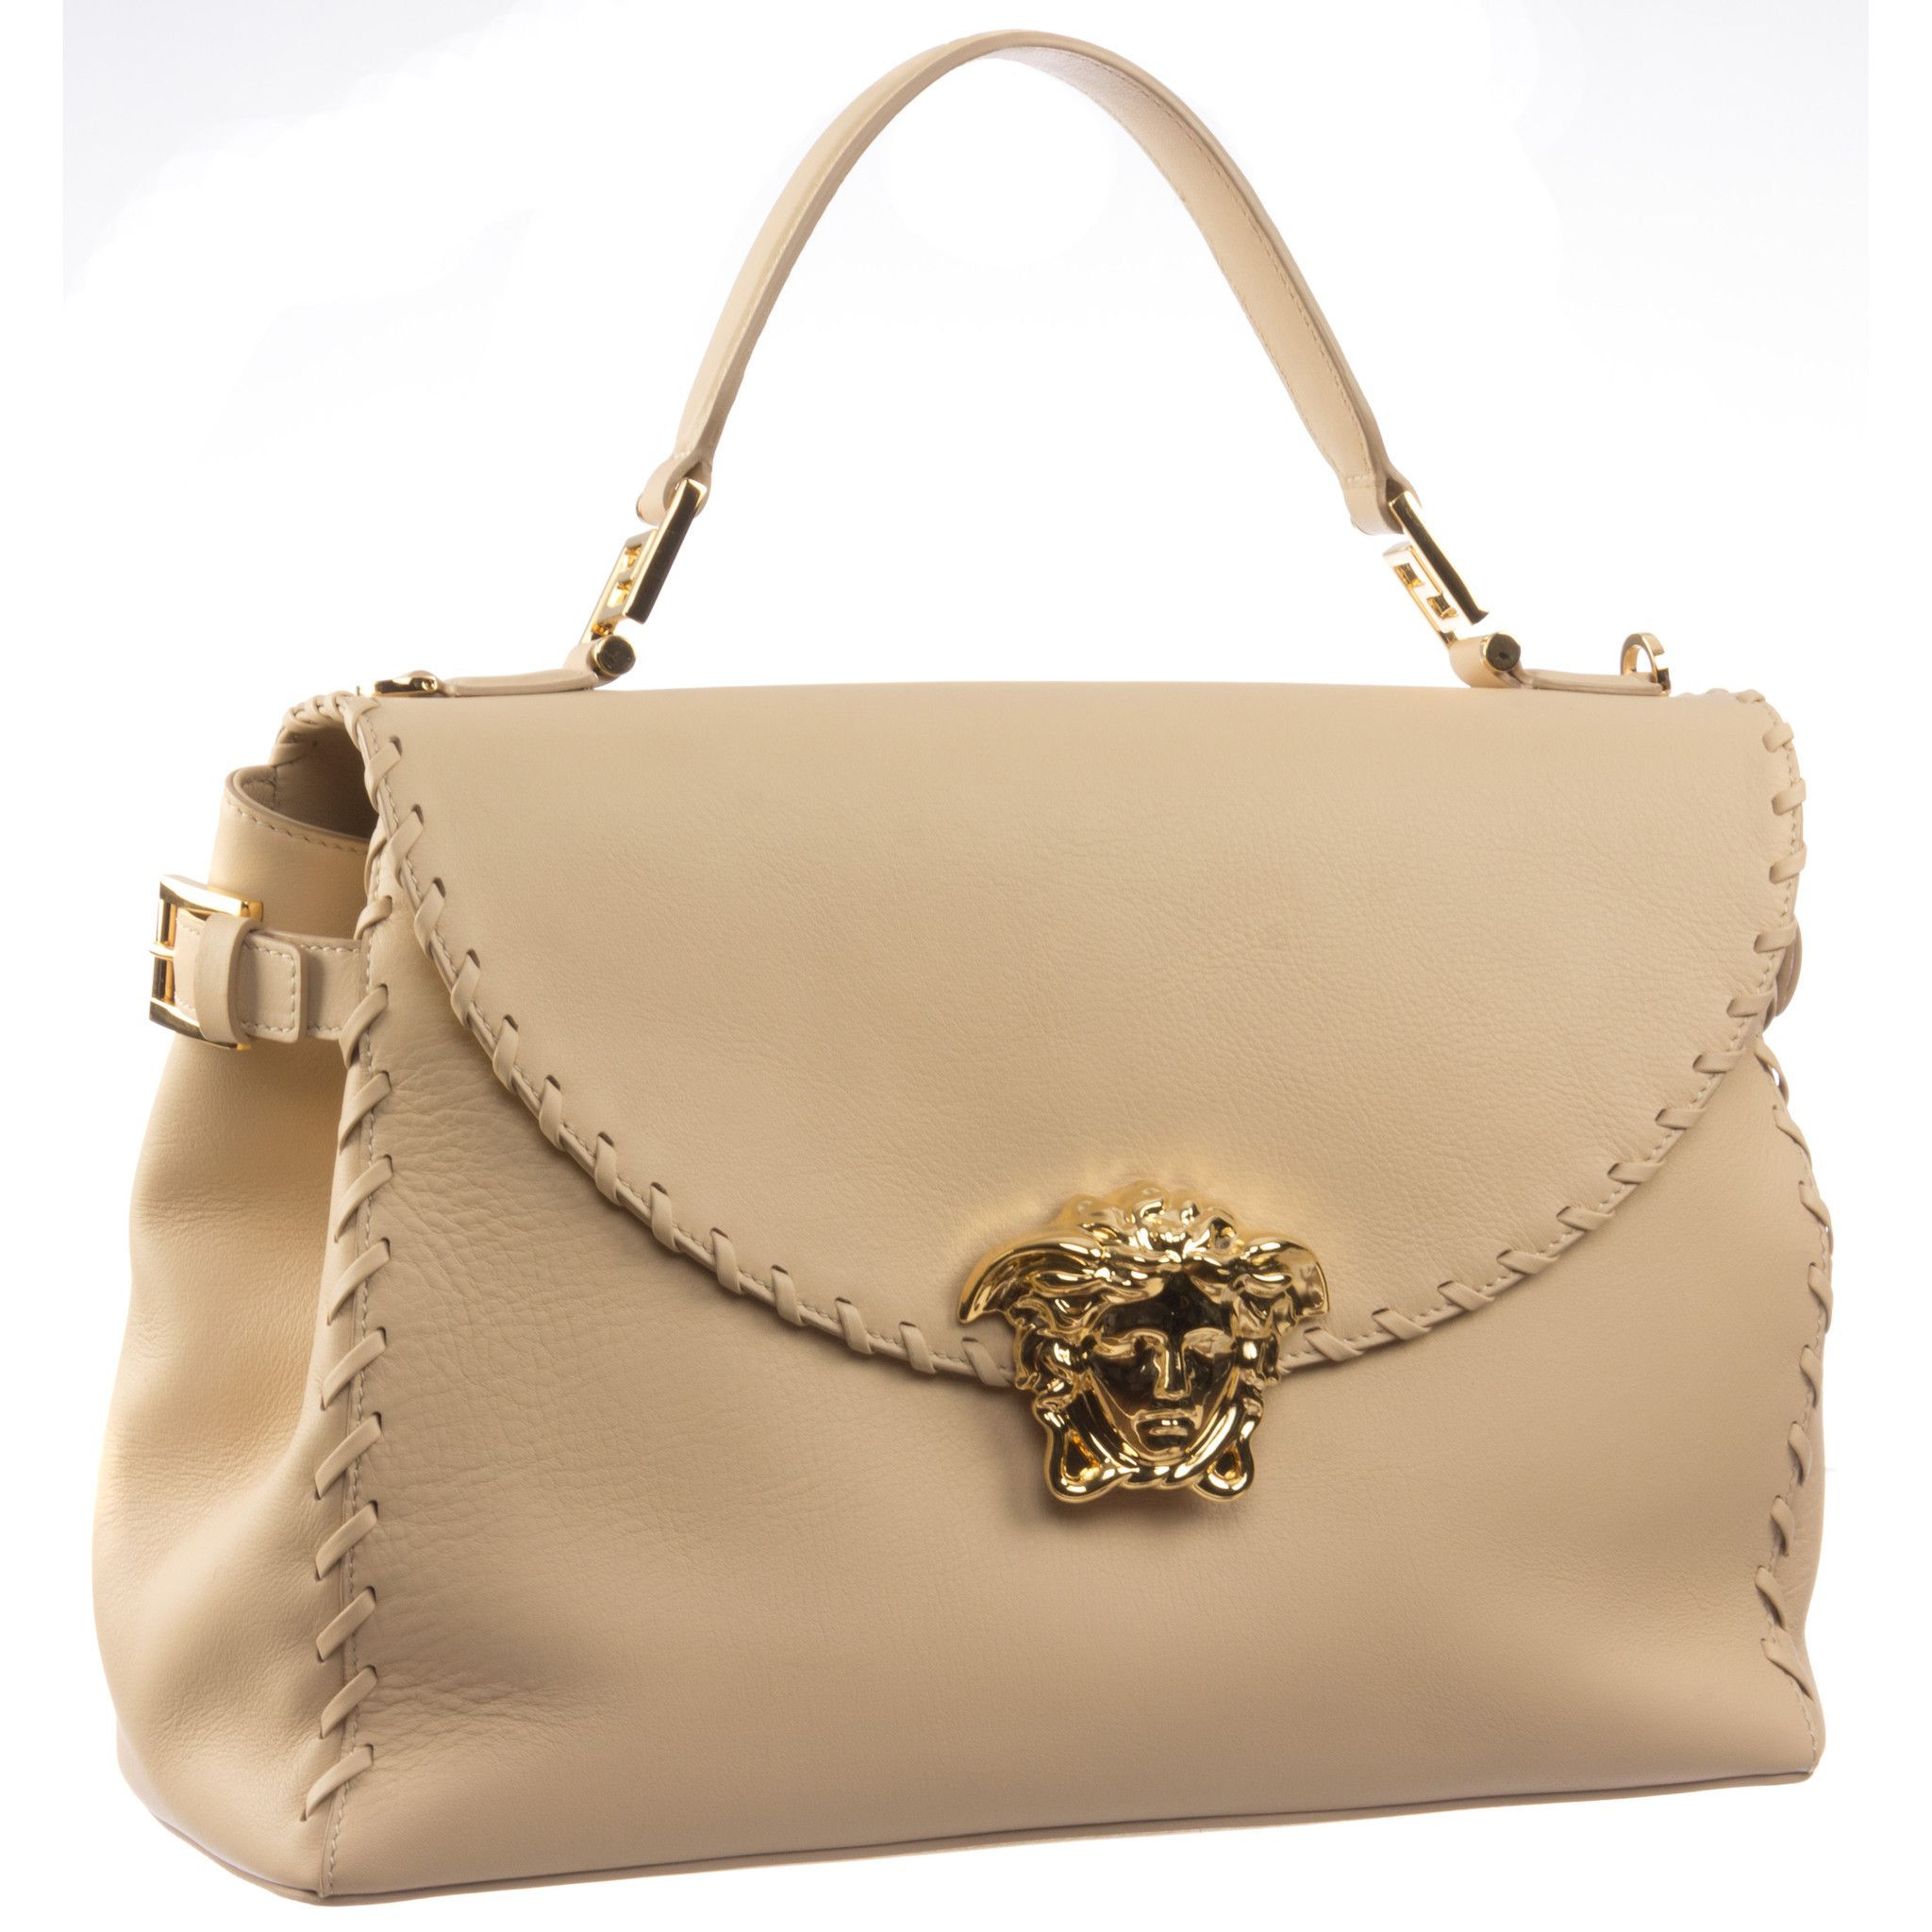 0d358ddfb0 Versace Signature Medusa Lock Leather Handbag-D420H